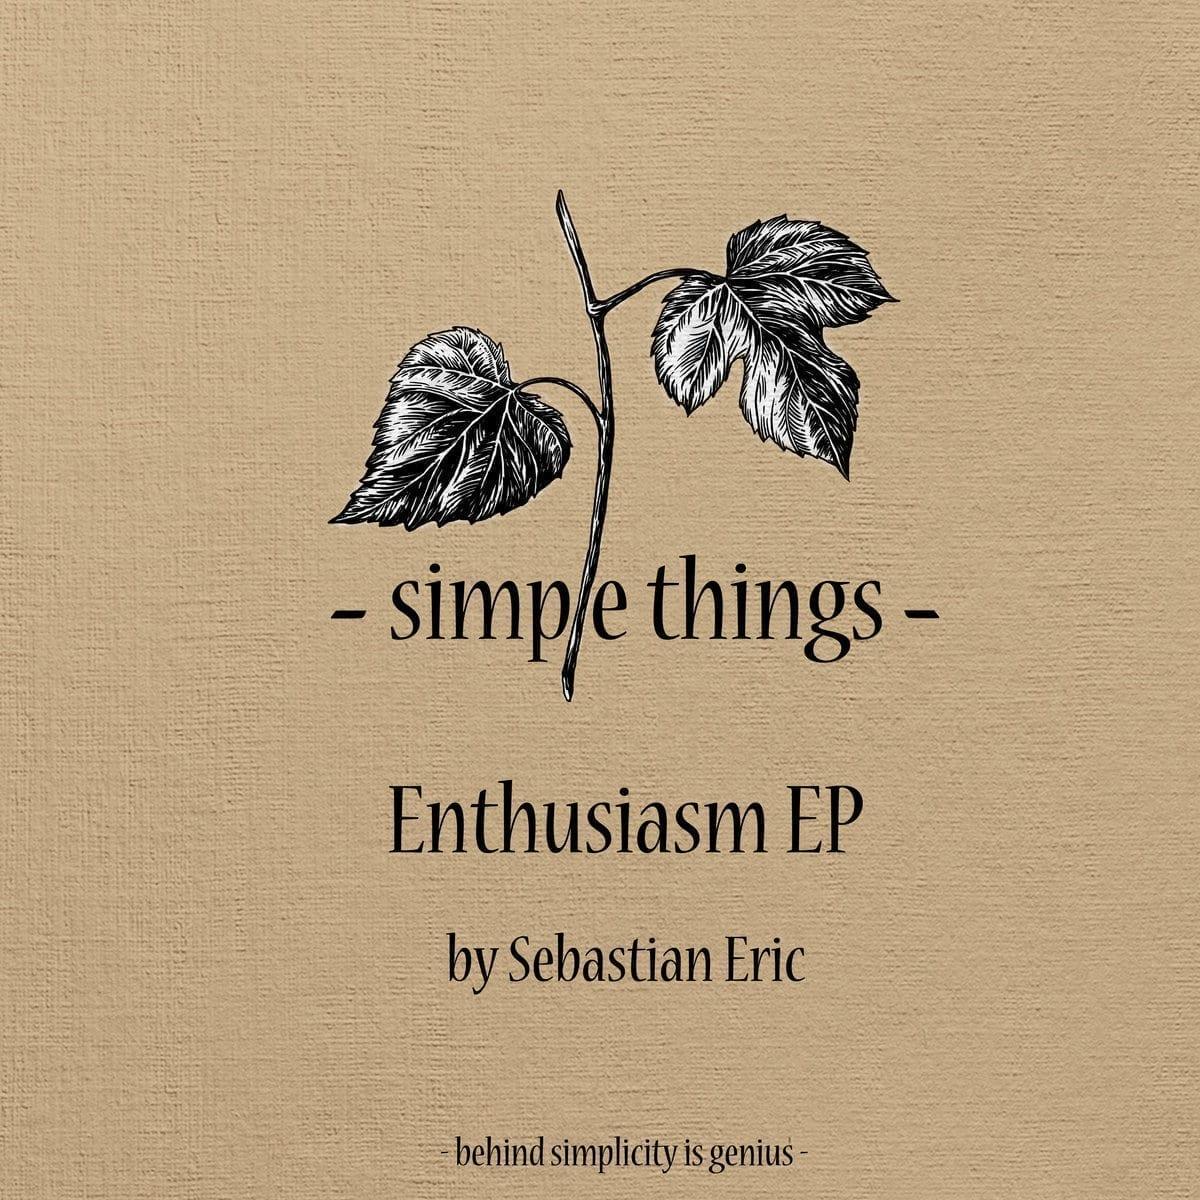 Sebastian Eric - Enthusiasm EP